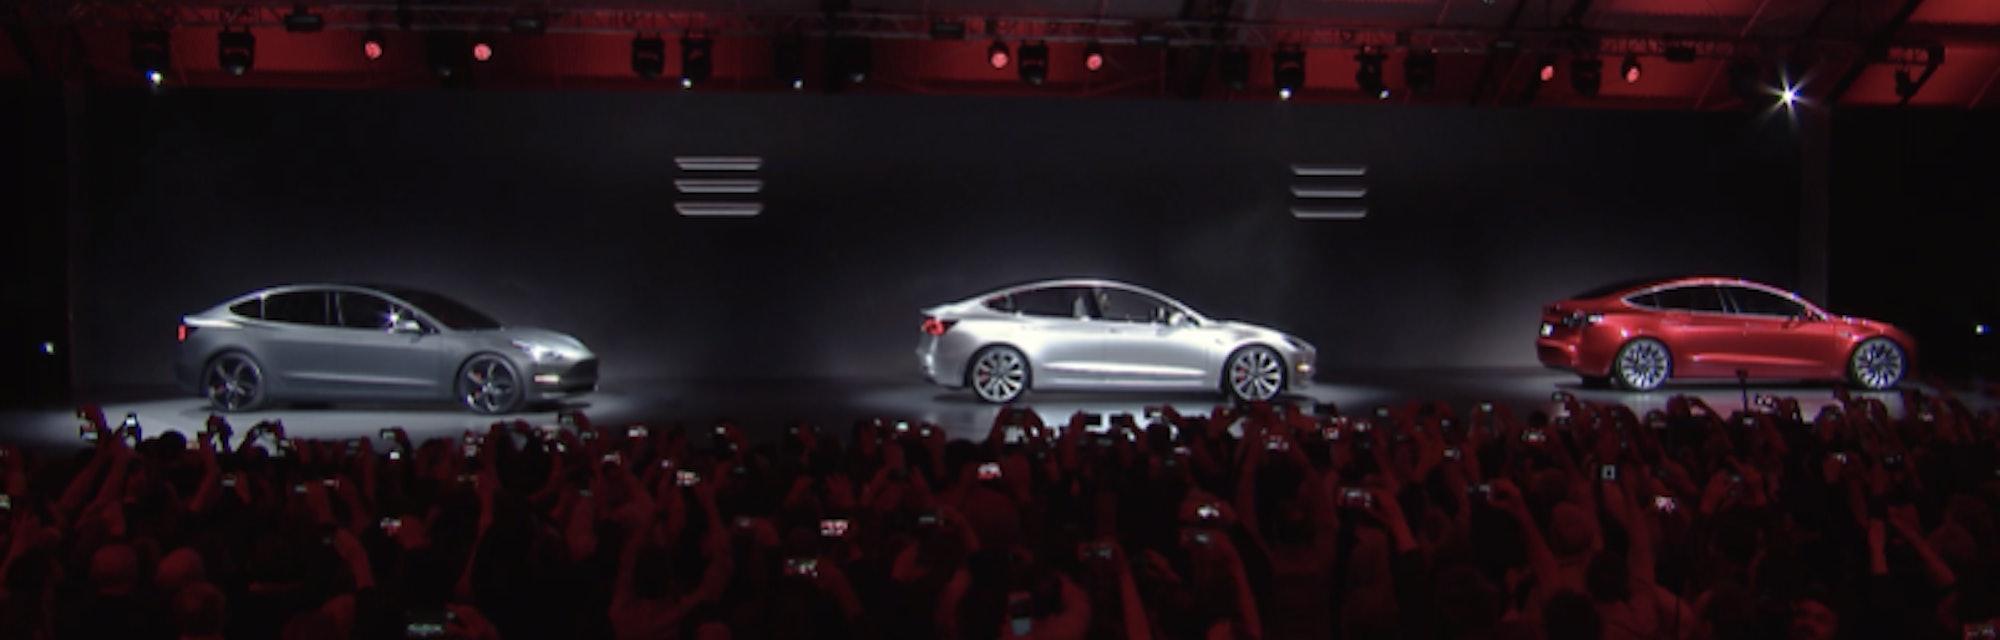 Tesla Model 3 Preorders Break 130,000 and Counting